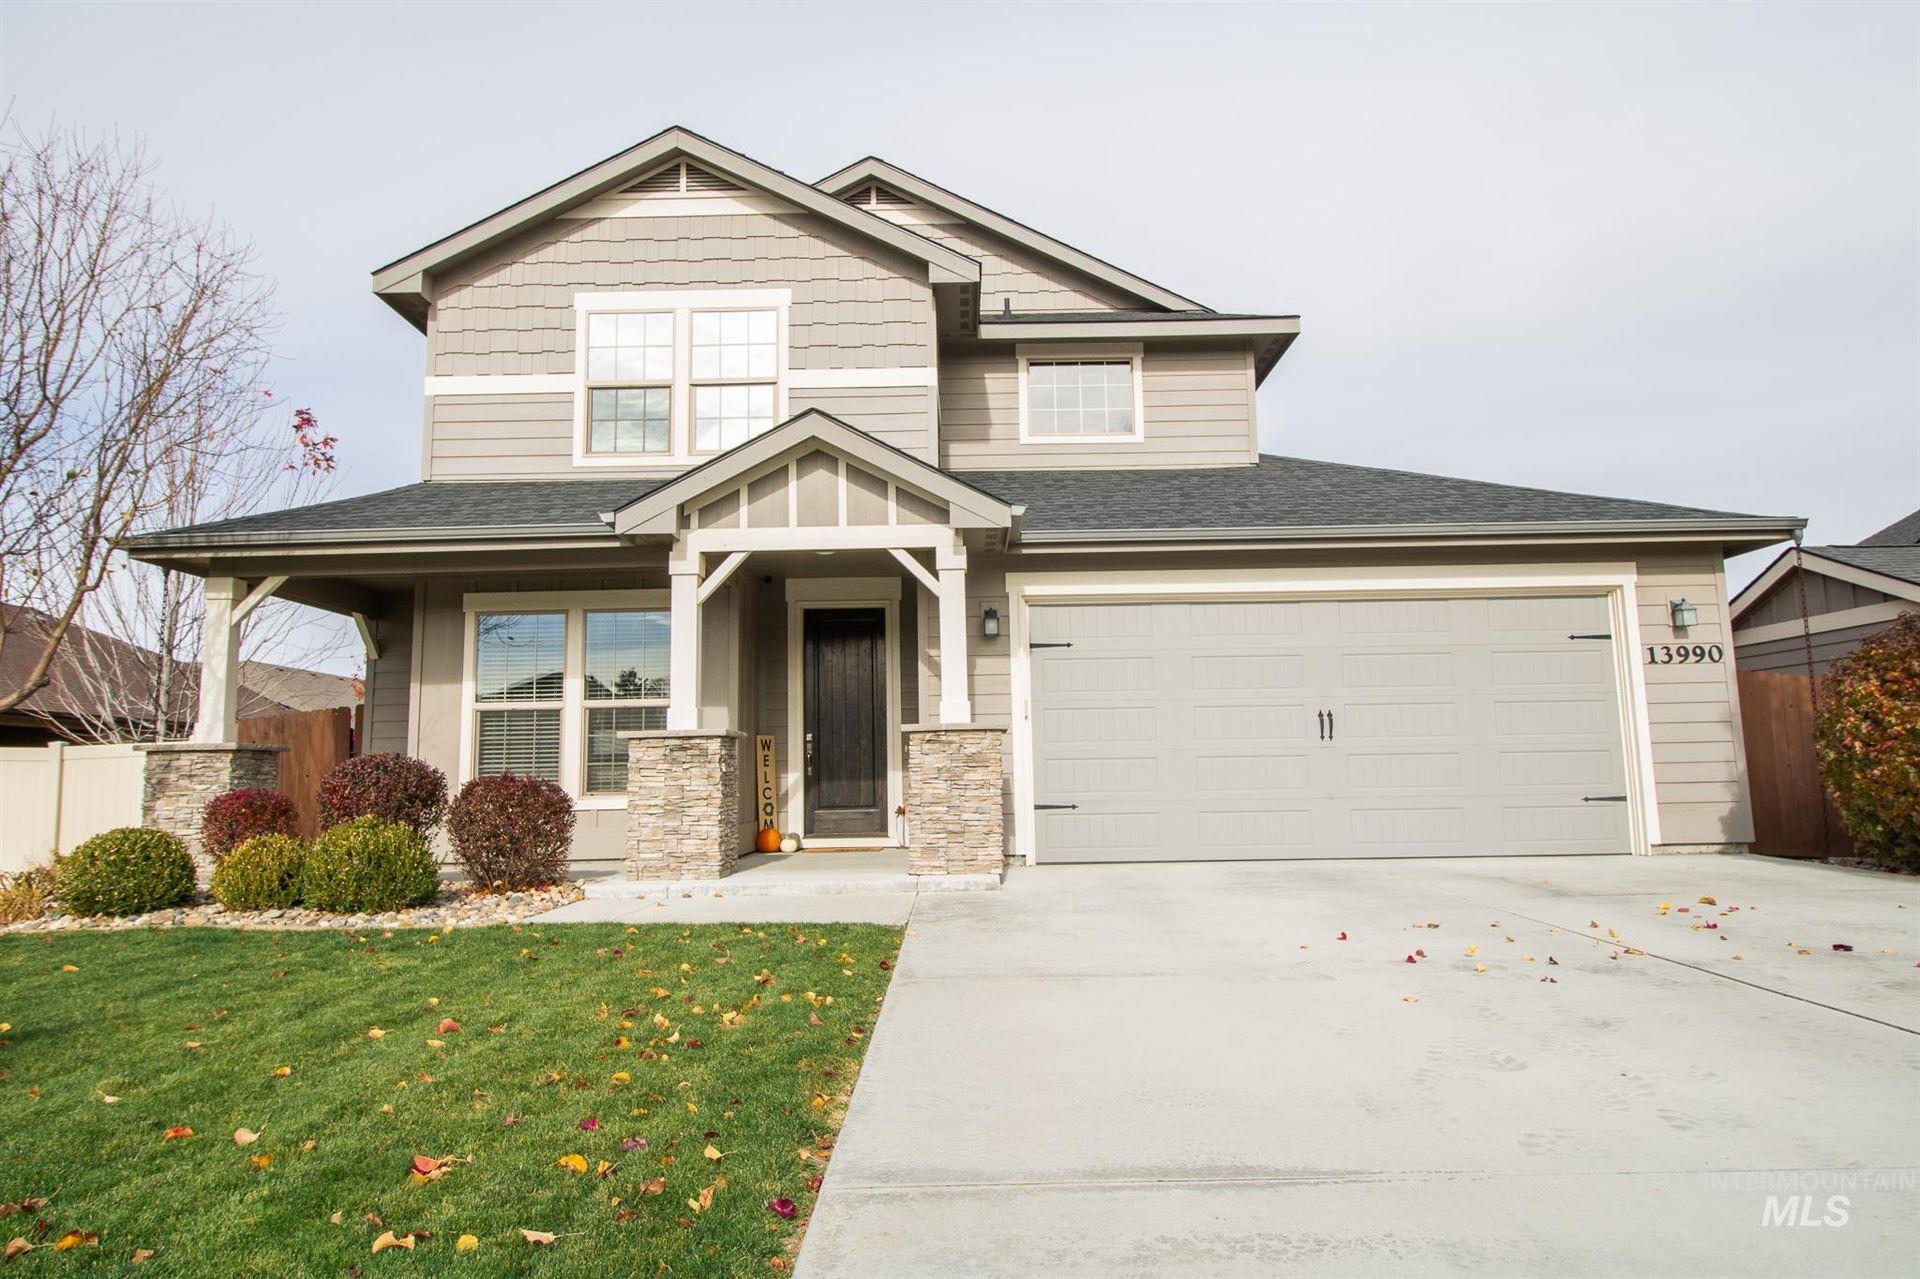 13990 W Milford Drive, Boise, ID 83713 - MLS#: 98822537